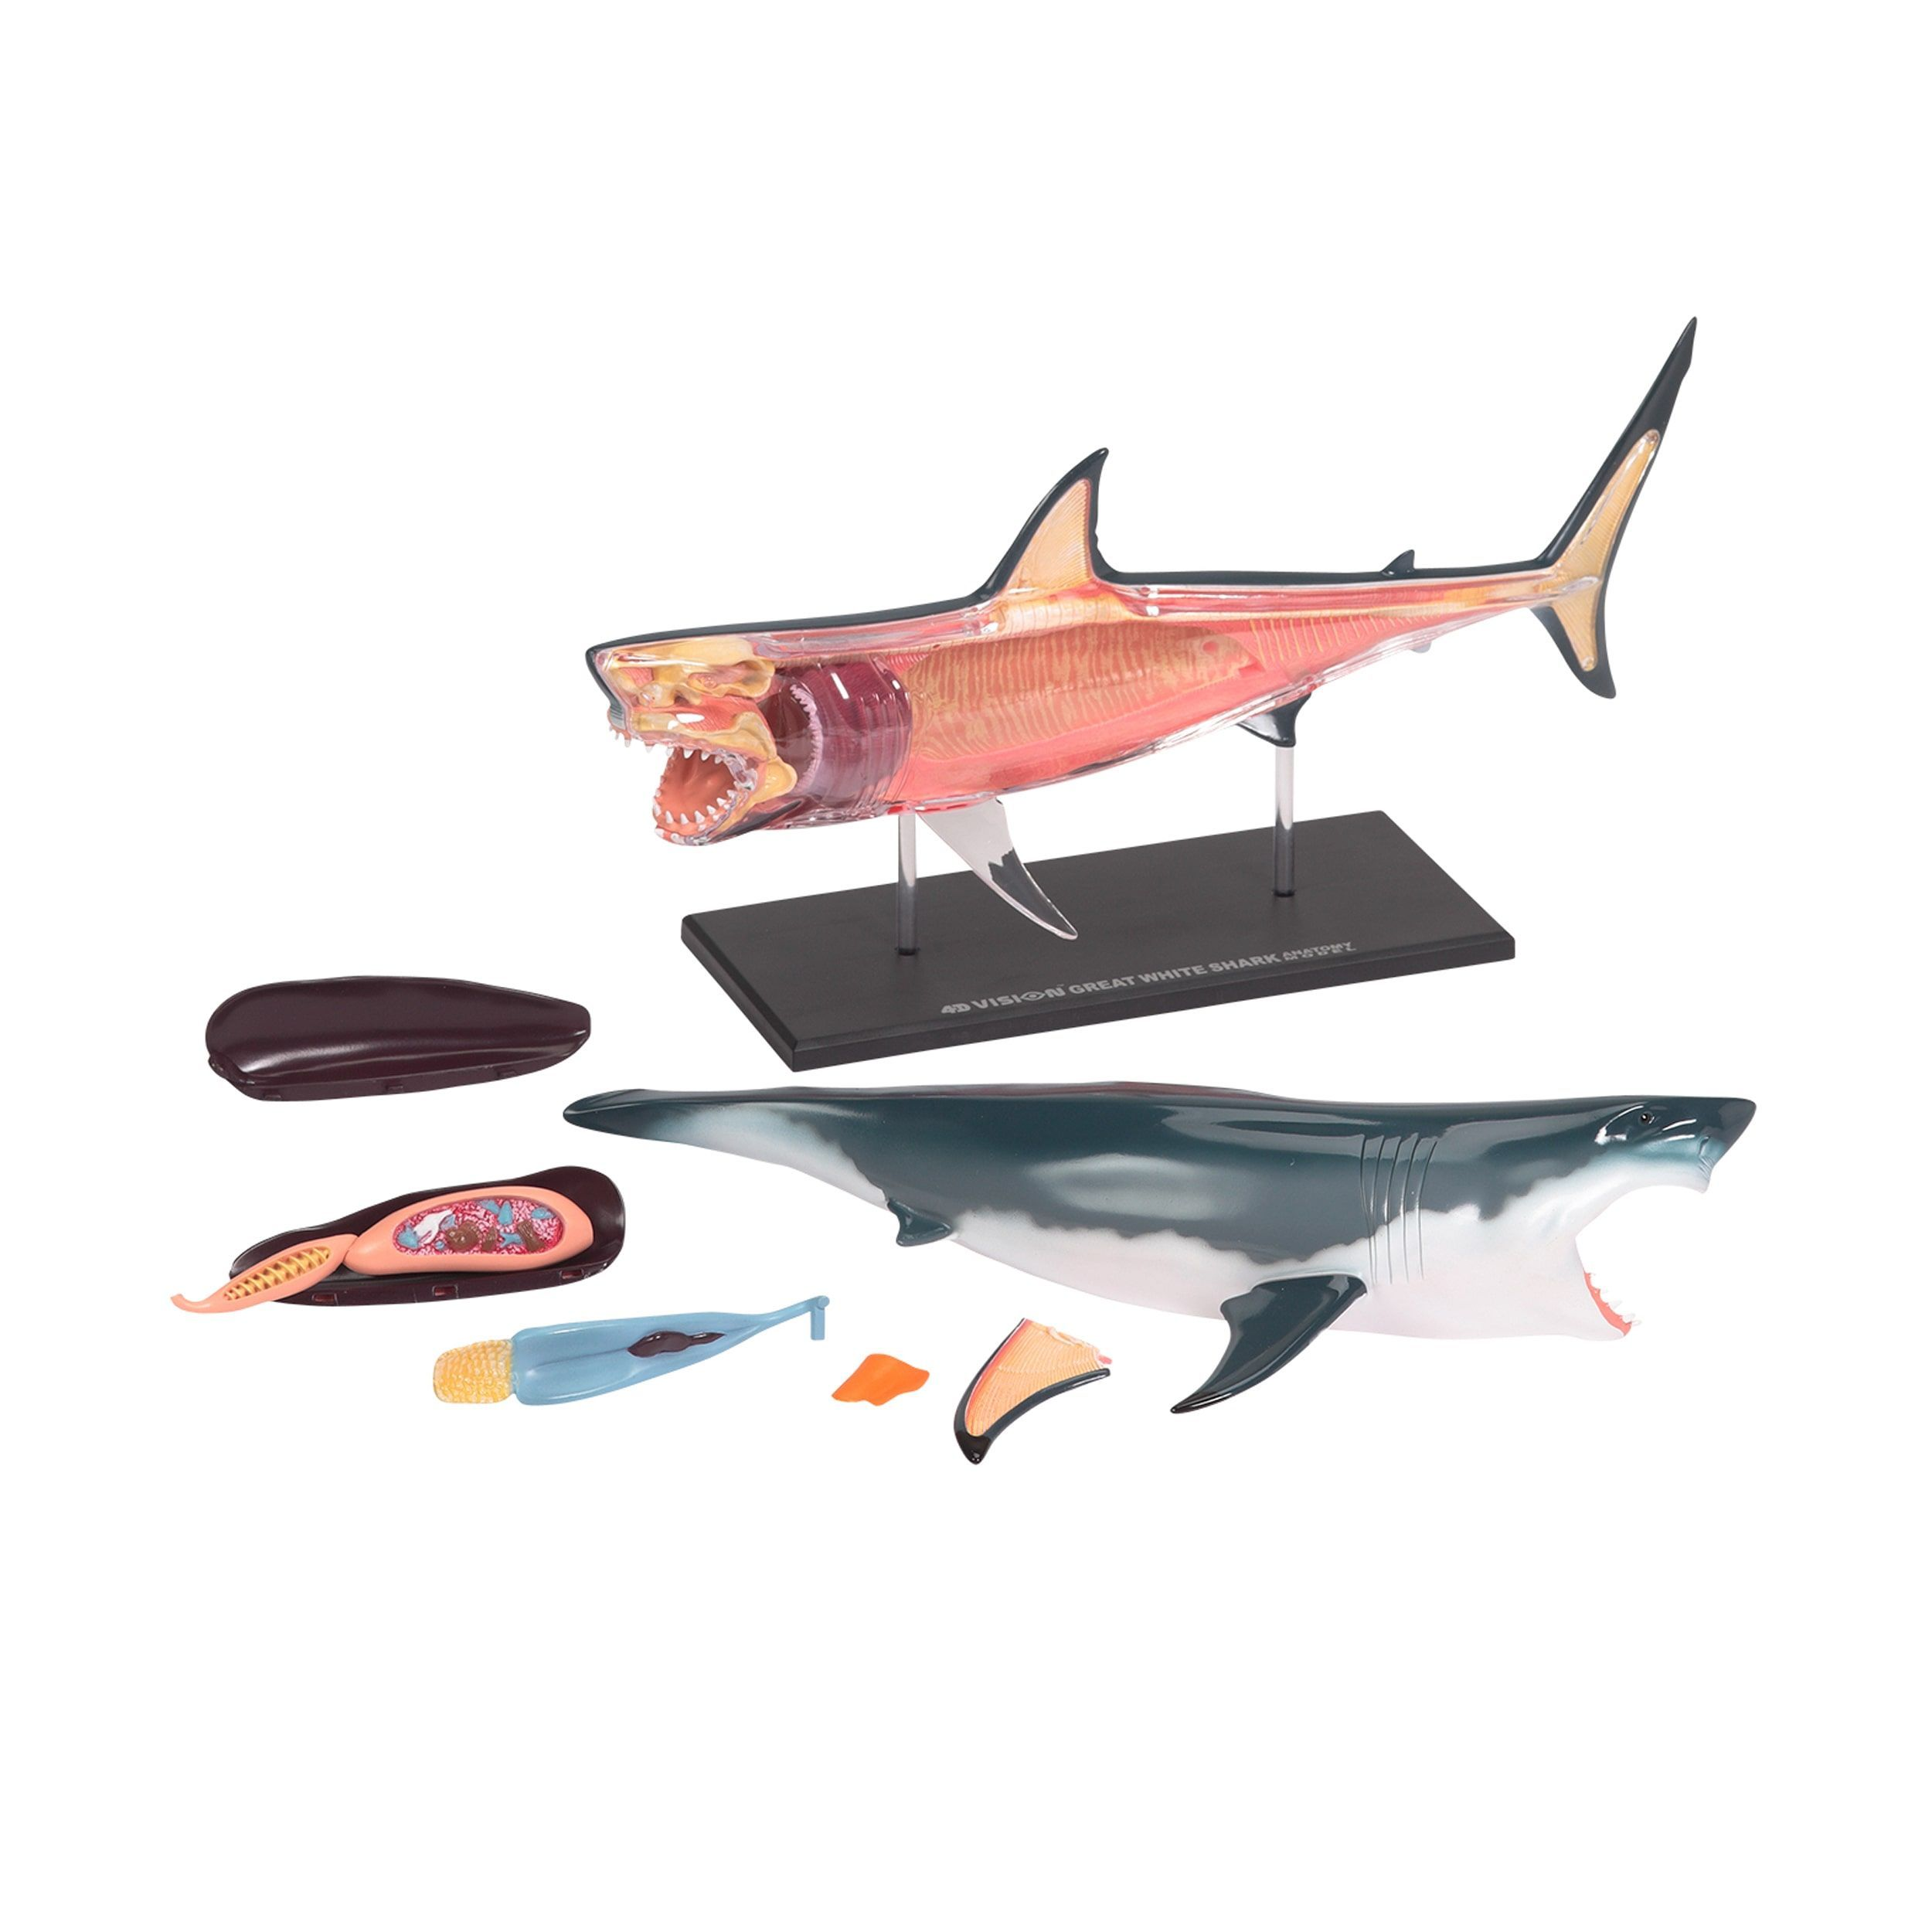 Warm Fuzzy Toys Shark Anatomy Model | Products | Pinterest | Anatomy ...